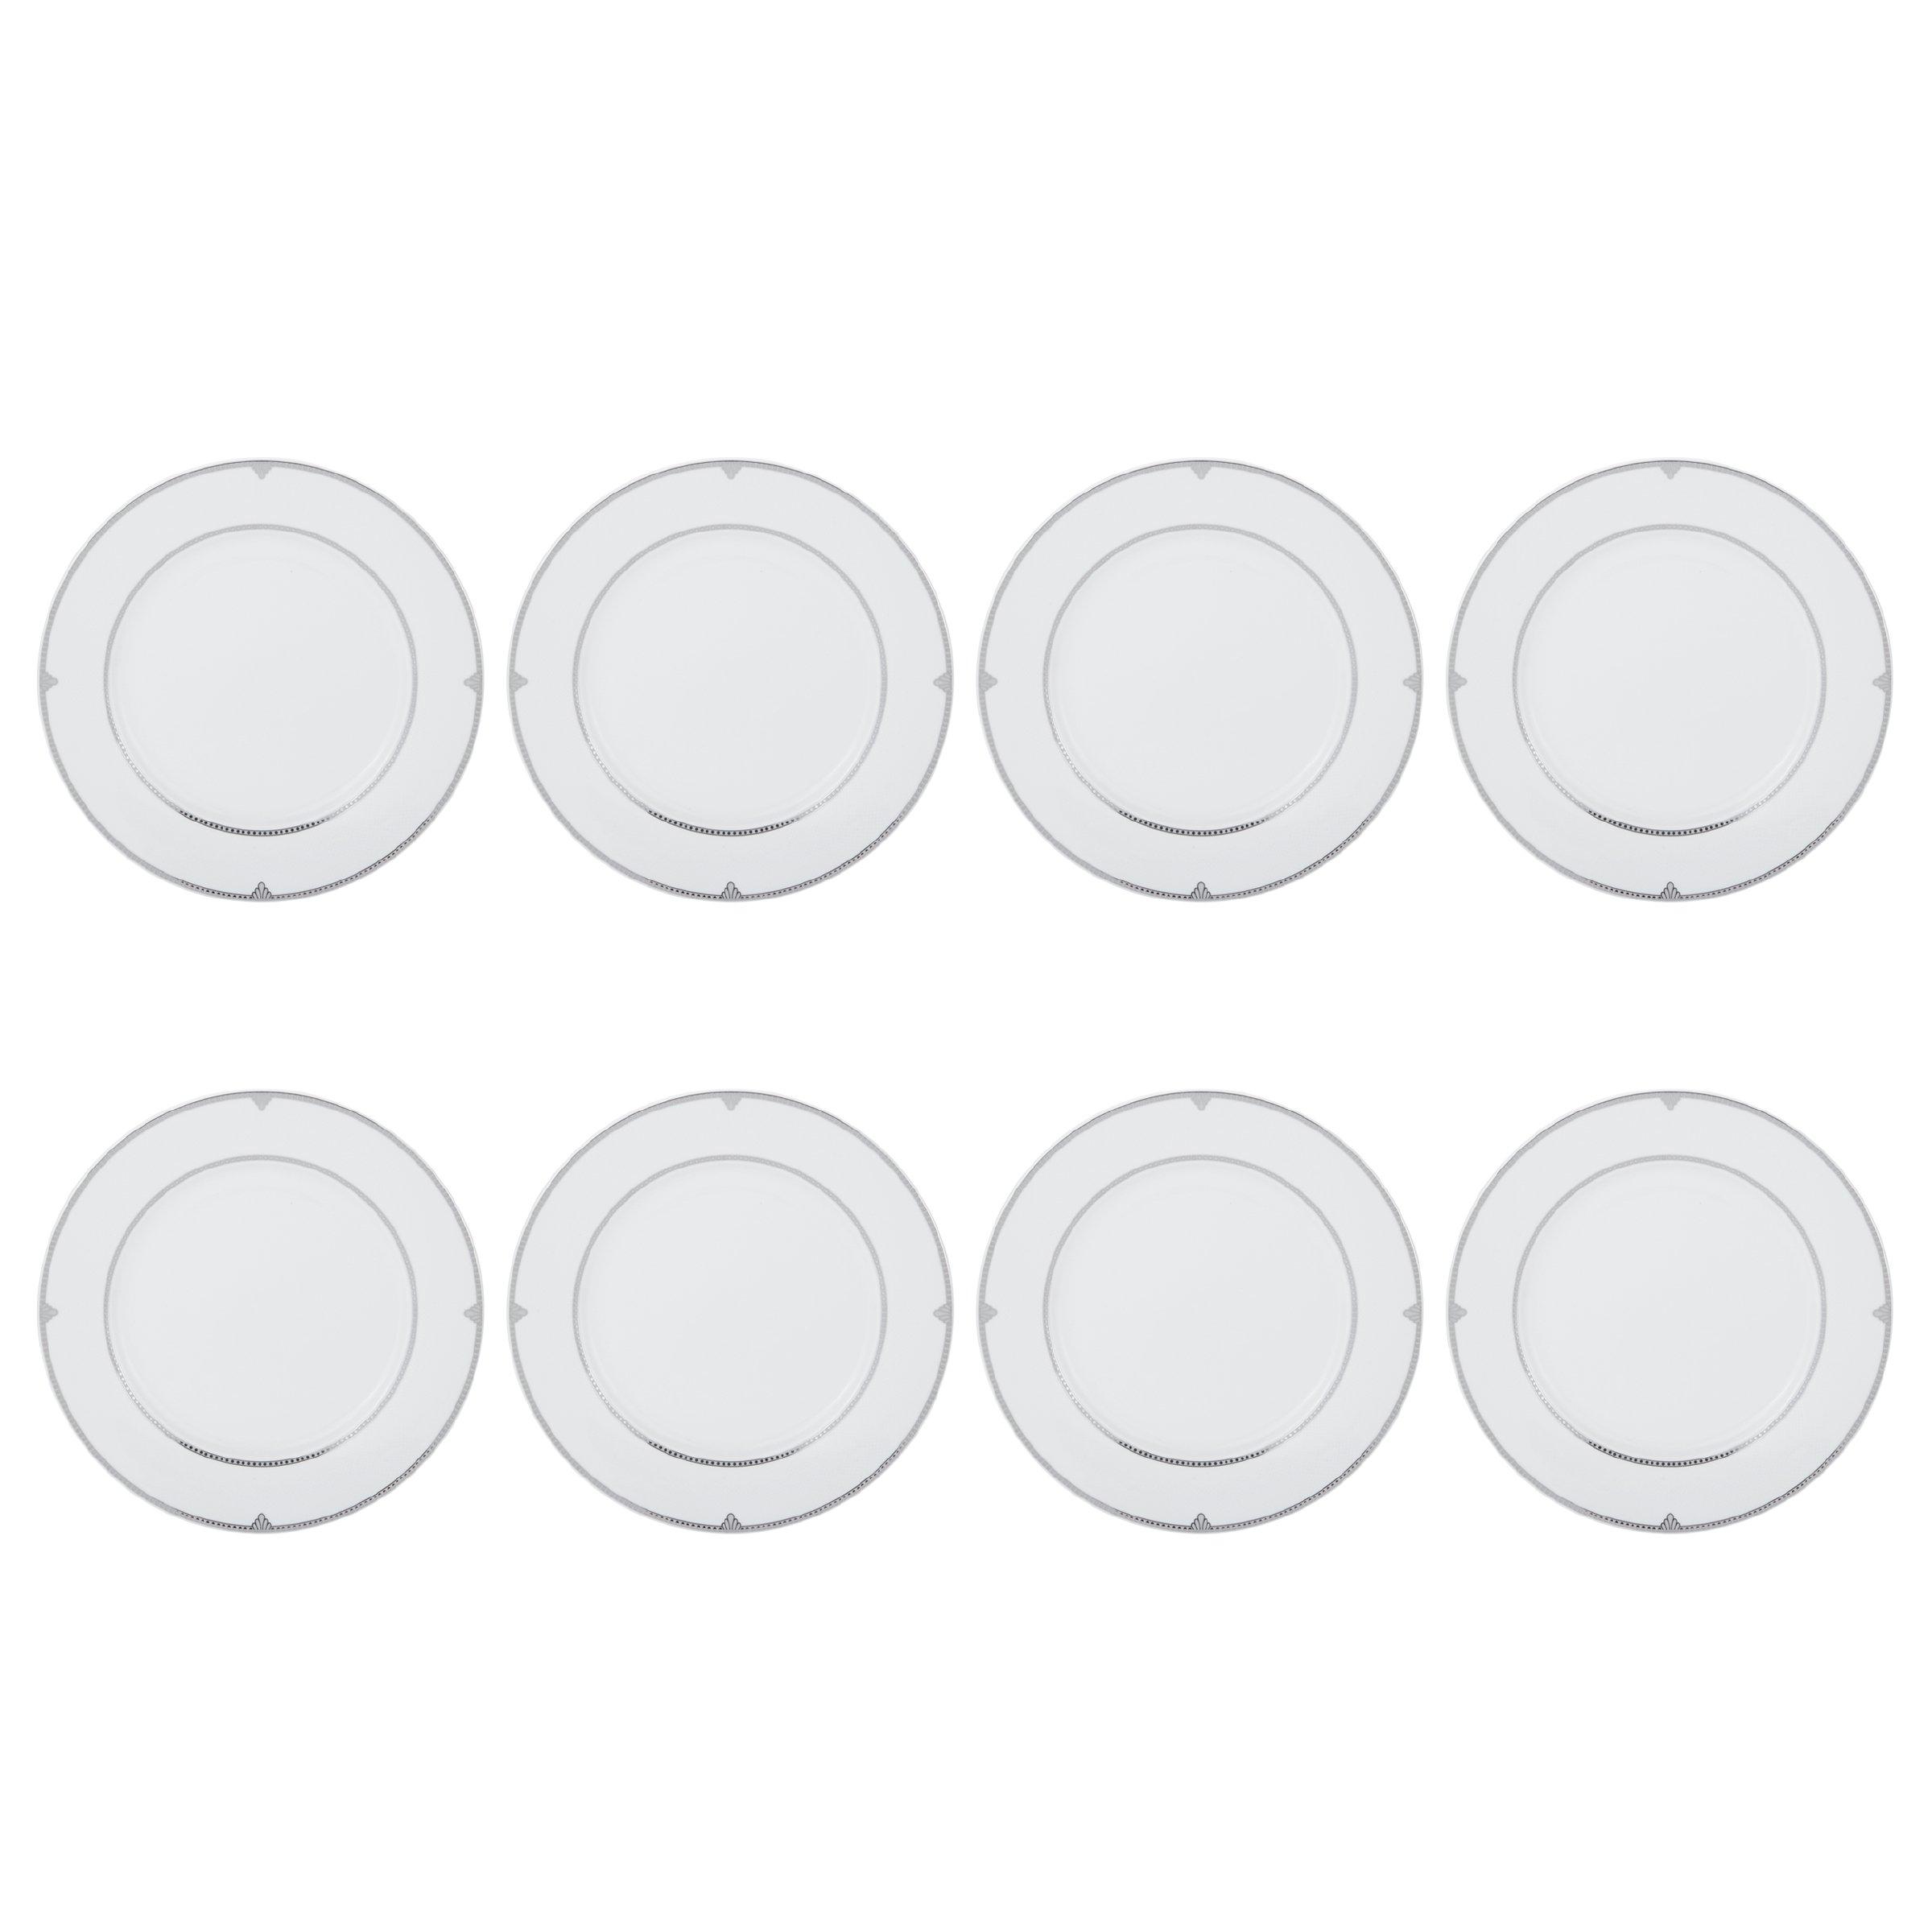 Mikasa Regent Bead 40-Piece Porcelain Dinnerware Set, Service for 8 by Mikasa (Image #2)